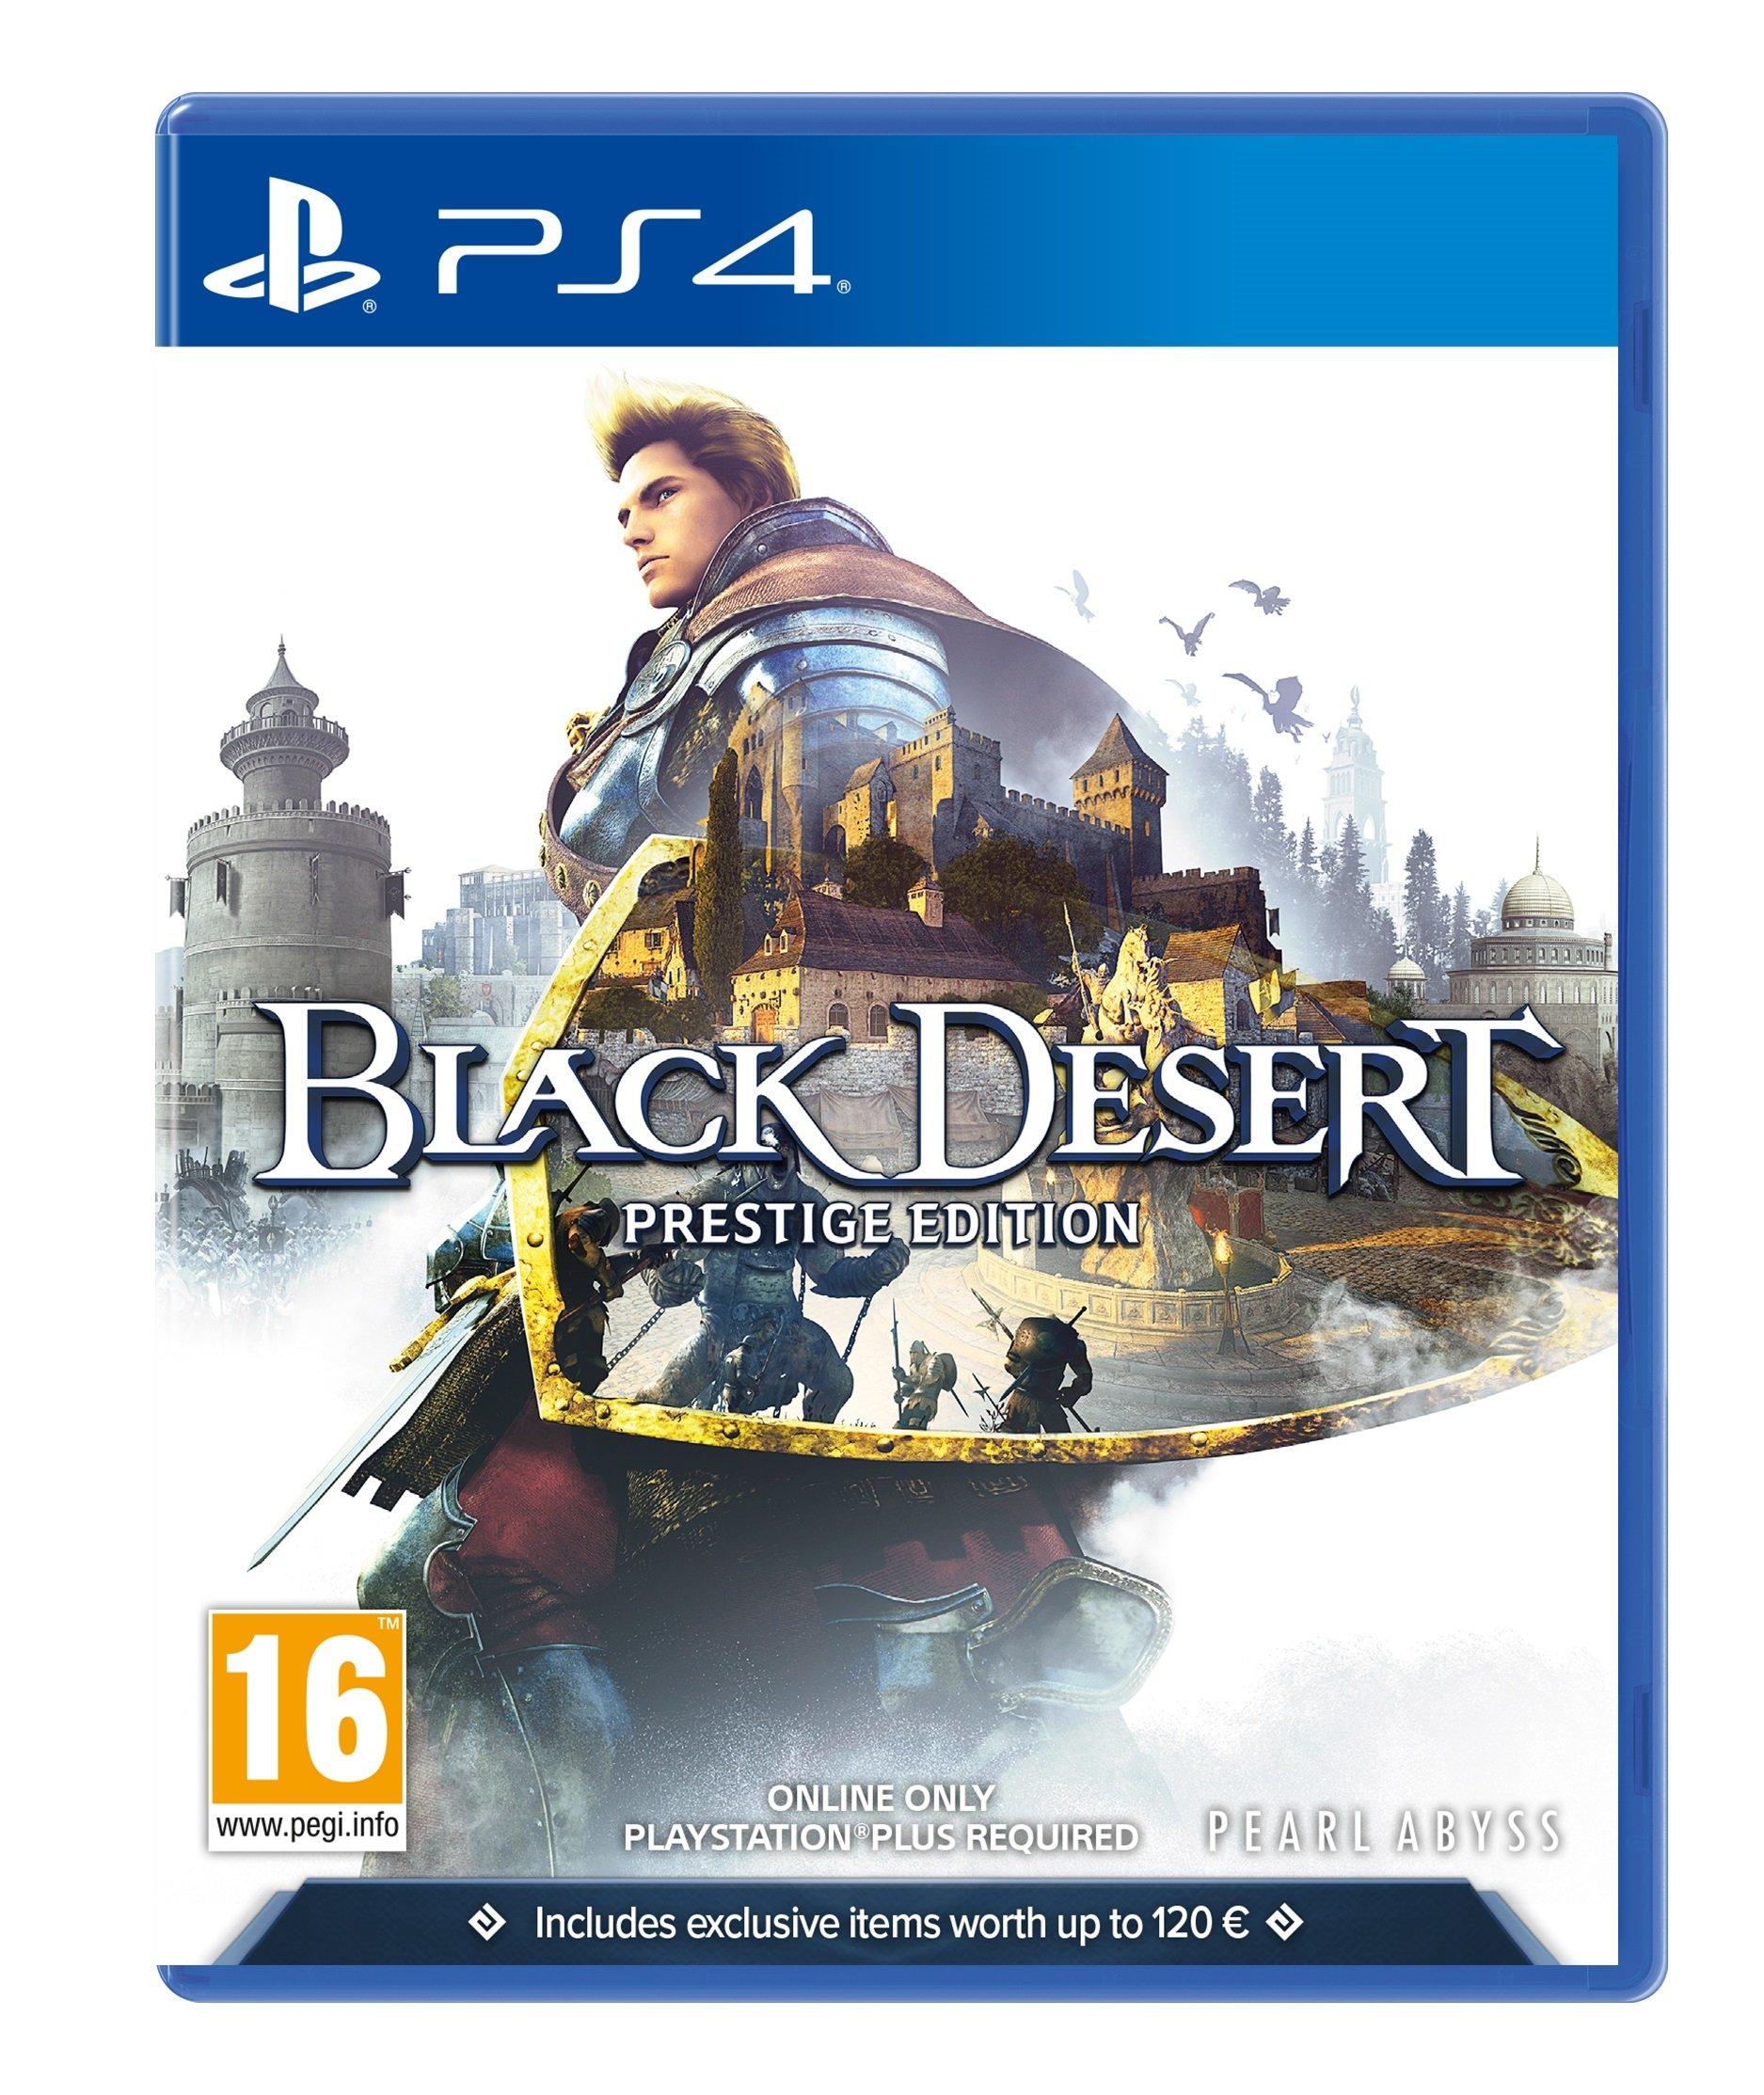 Black Desert: Prestige Edition